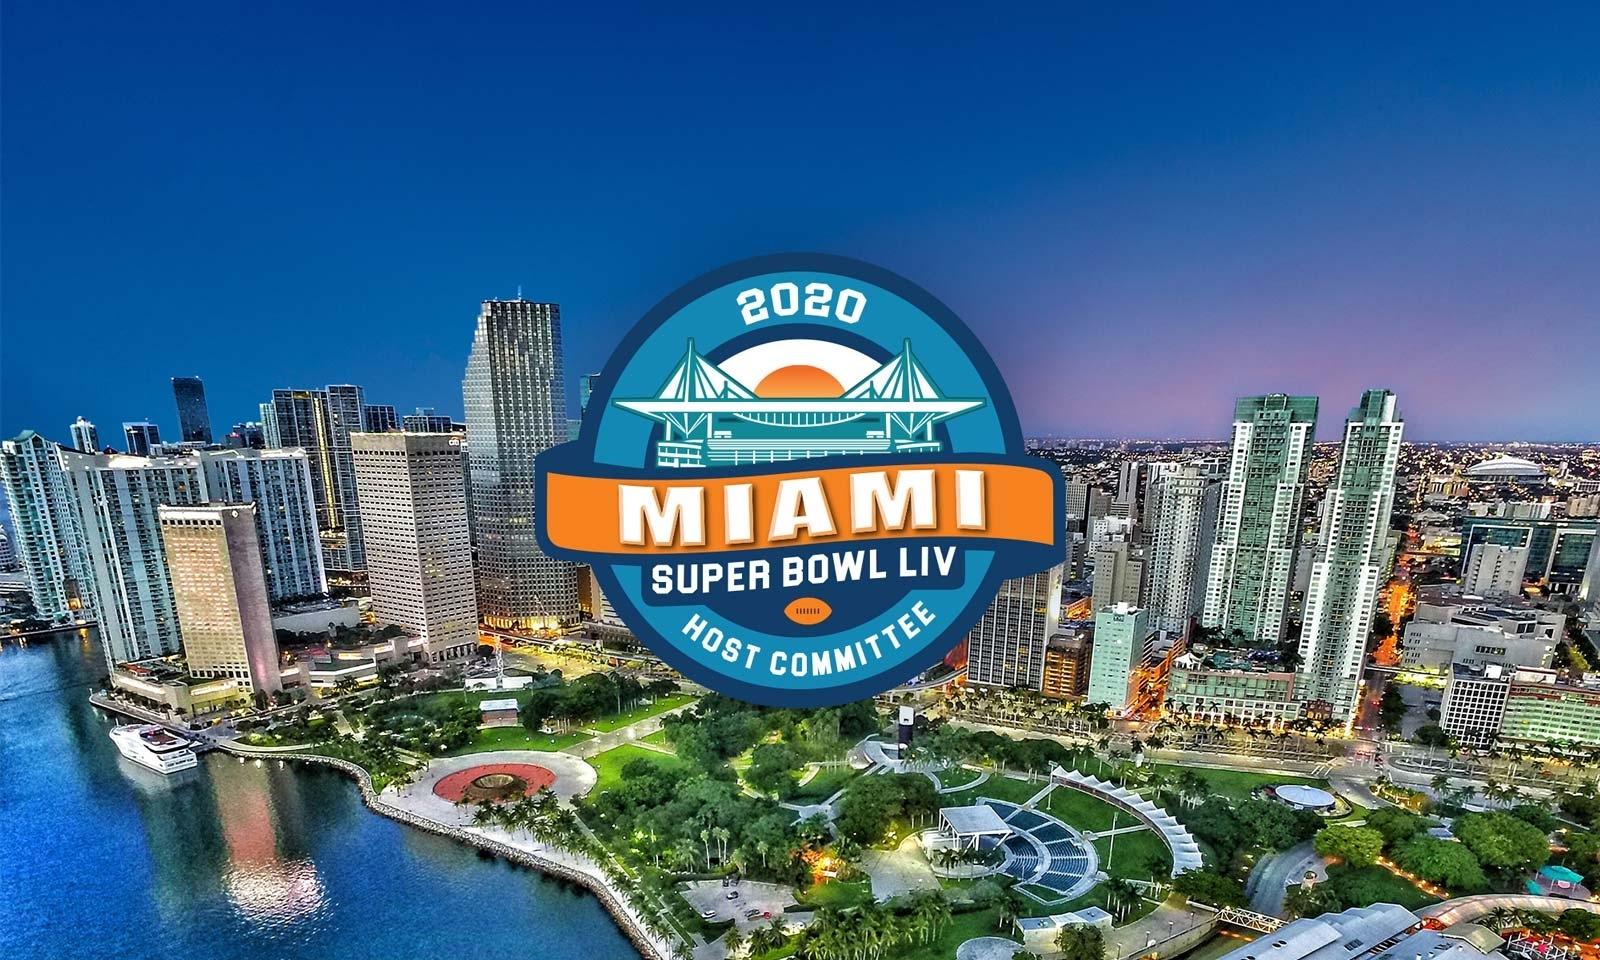 2020 Super Bowl Liv Host Committee Main_Image - Advantage inside Miami Florida Super Bowl 2020